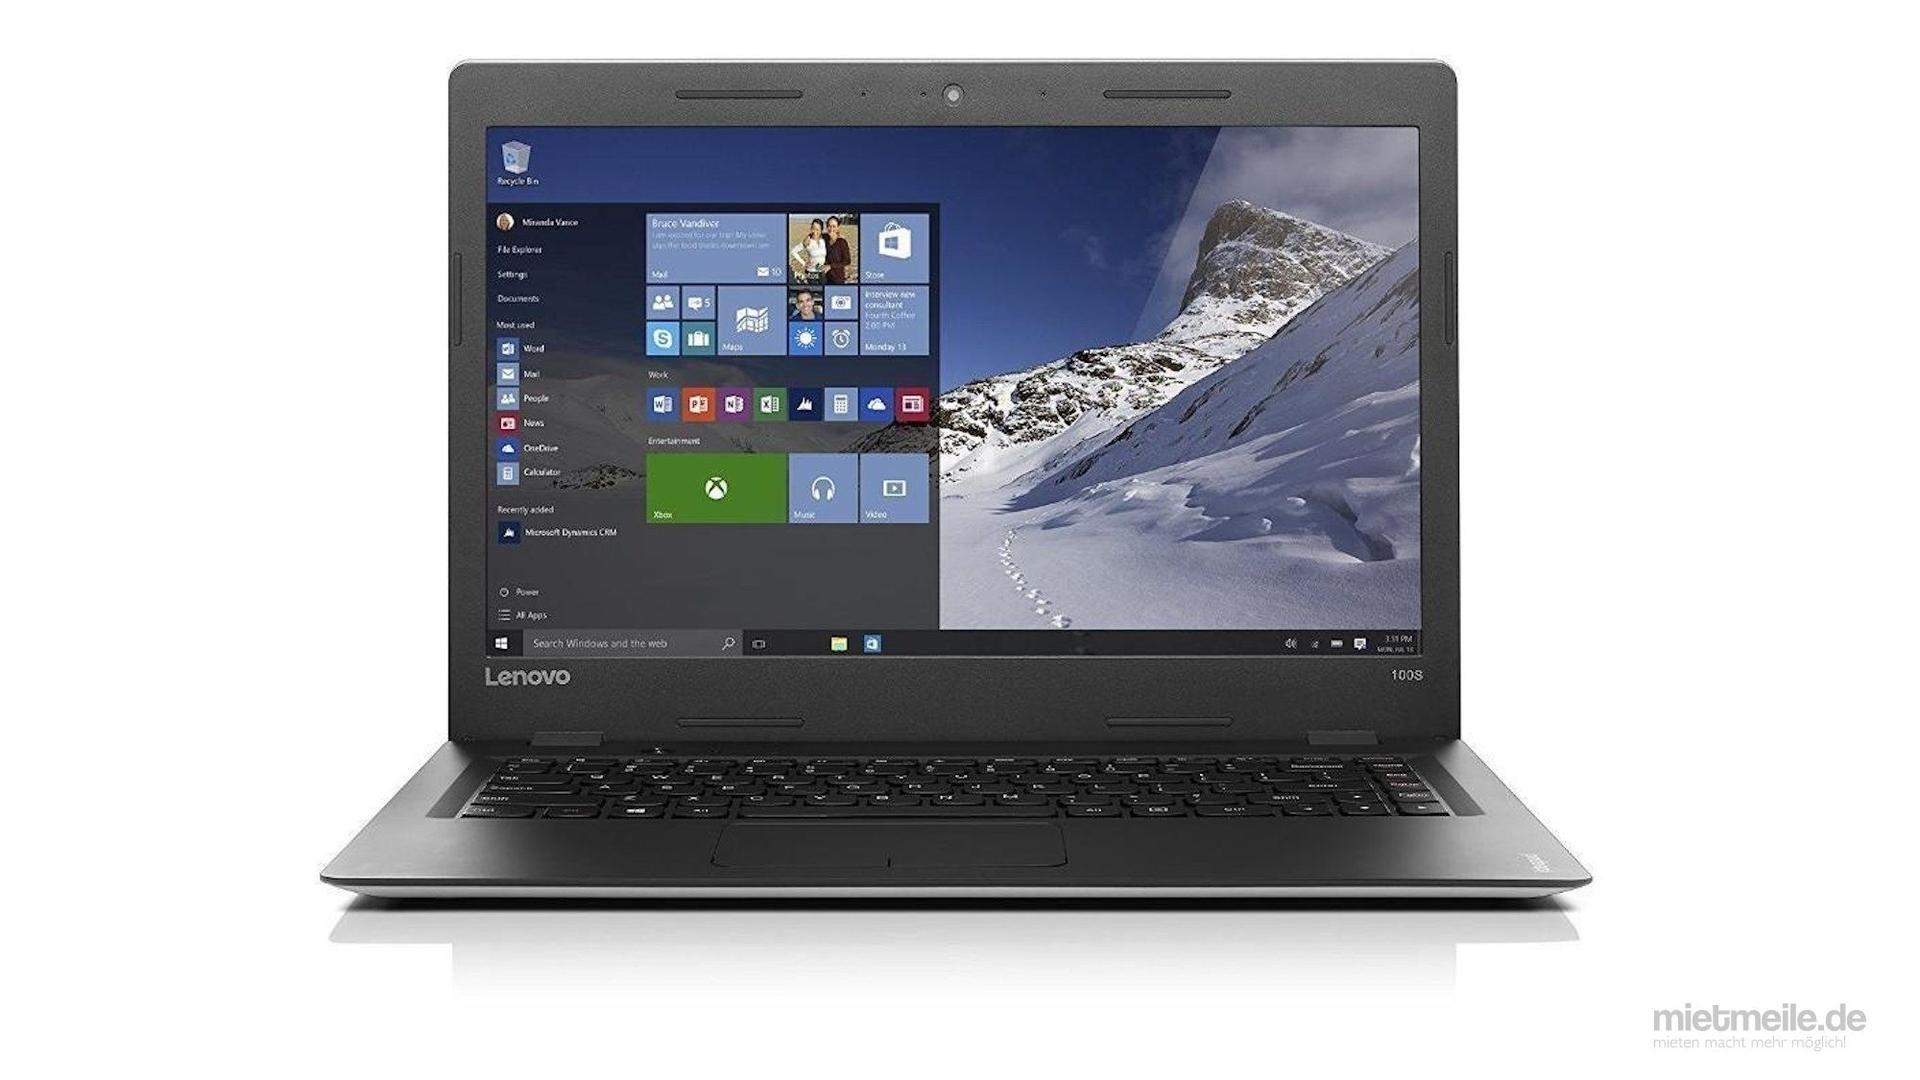 Laptop mieten & vermieten - Laptop Netbook Notebook Lenovo IdeaPad Computer in Schkeuditz